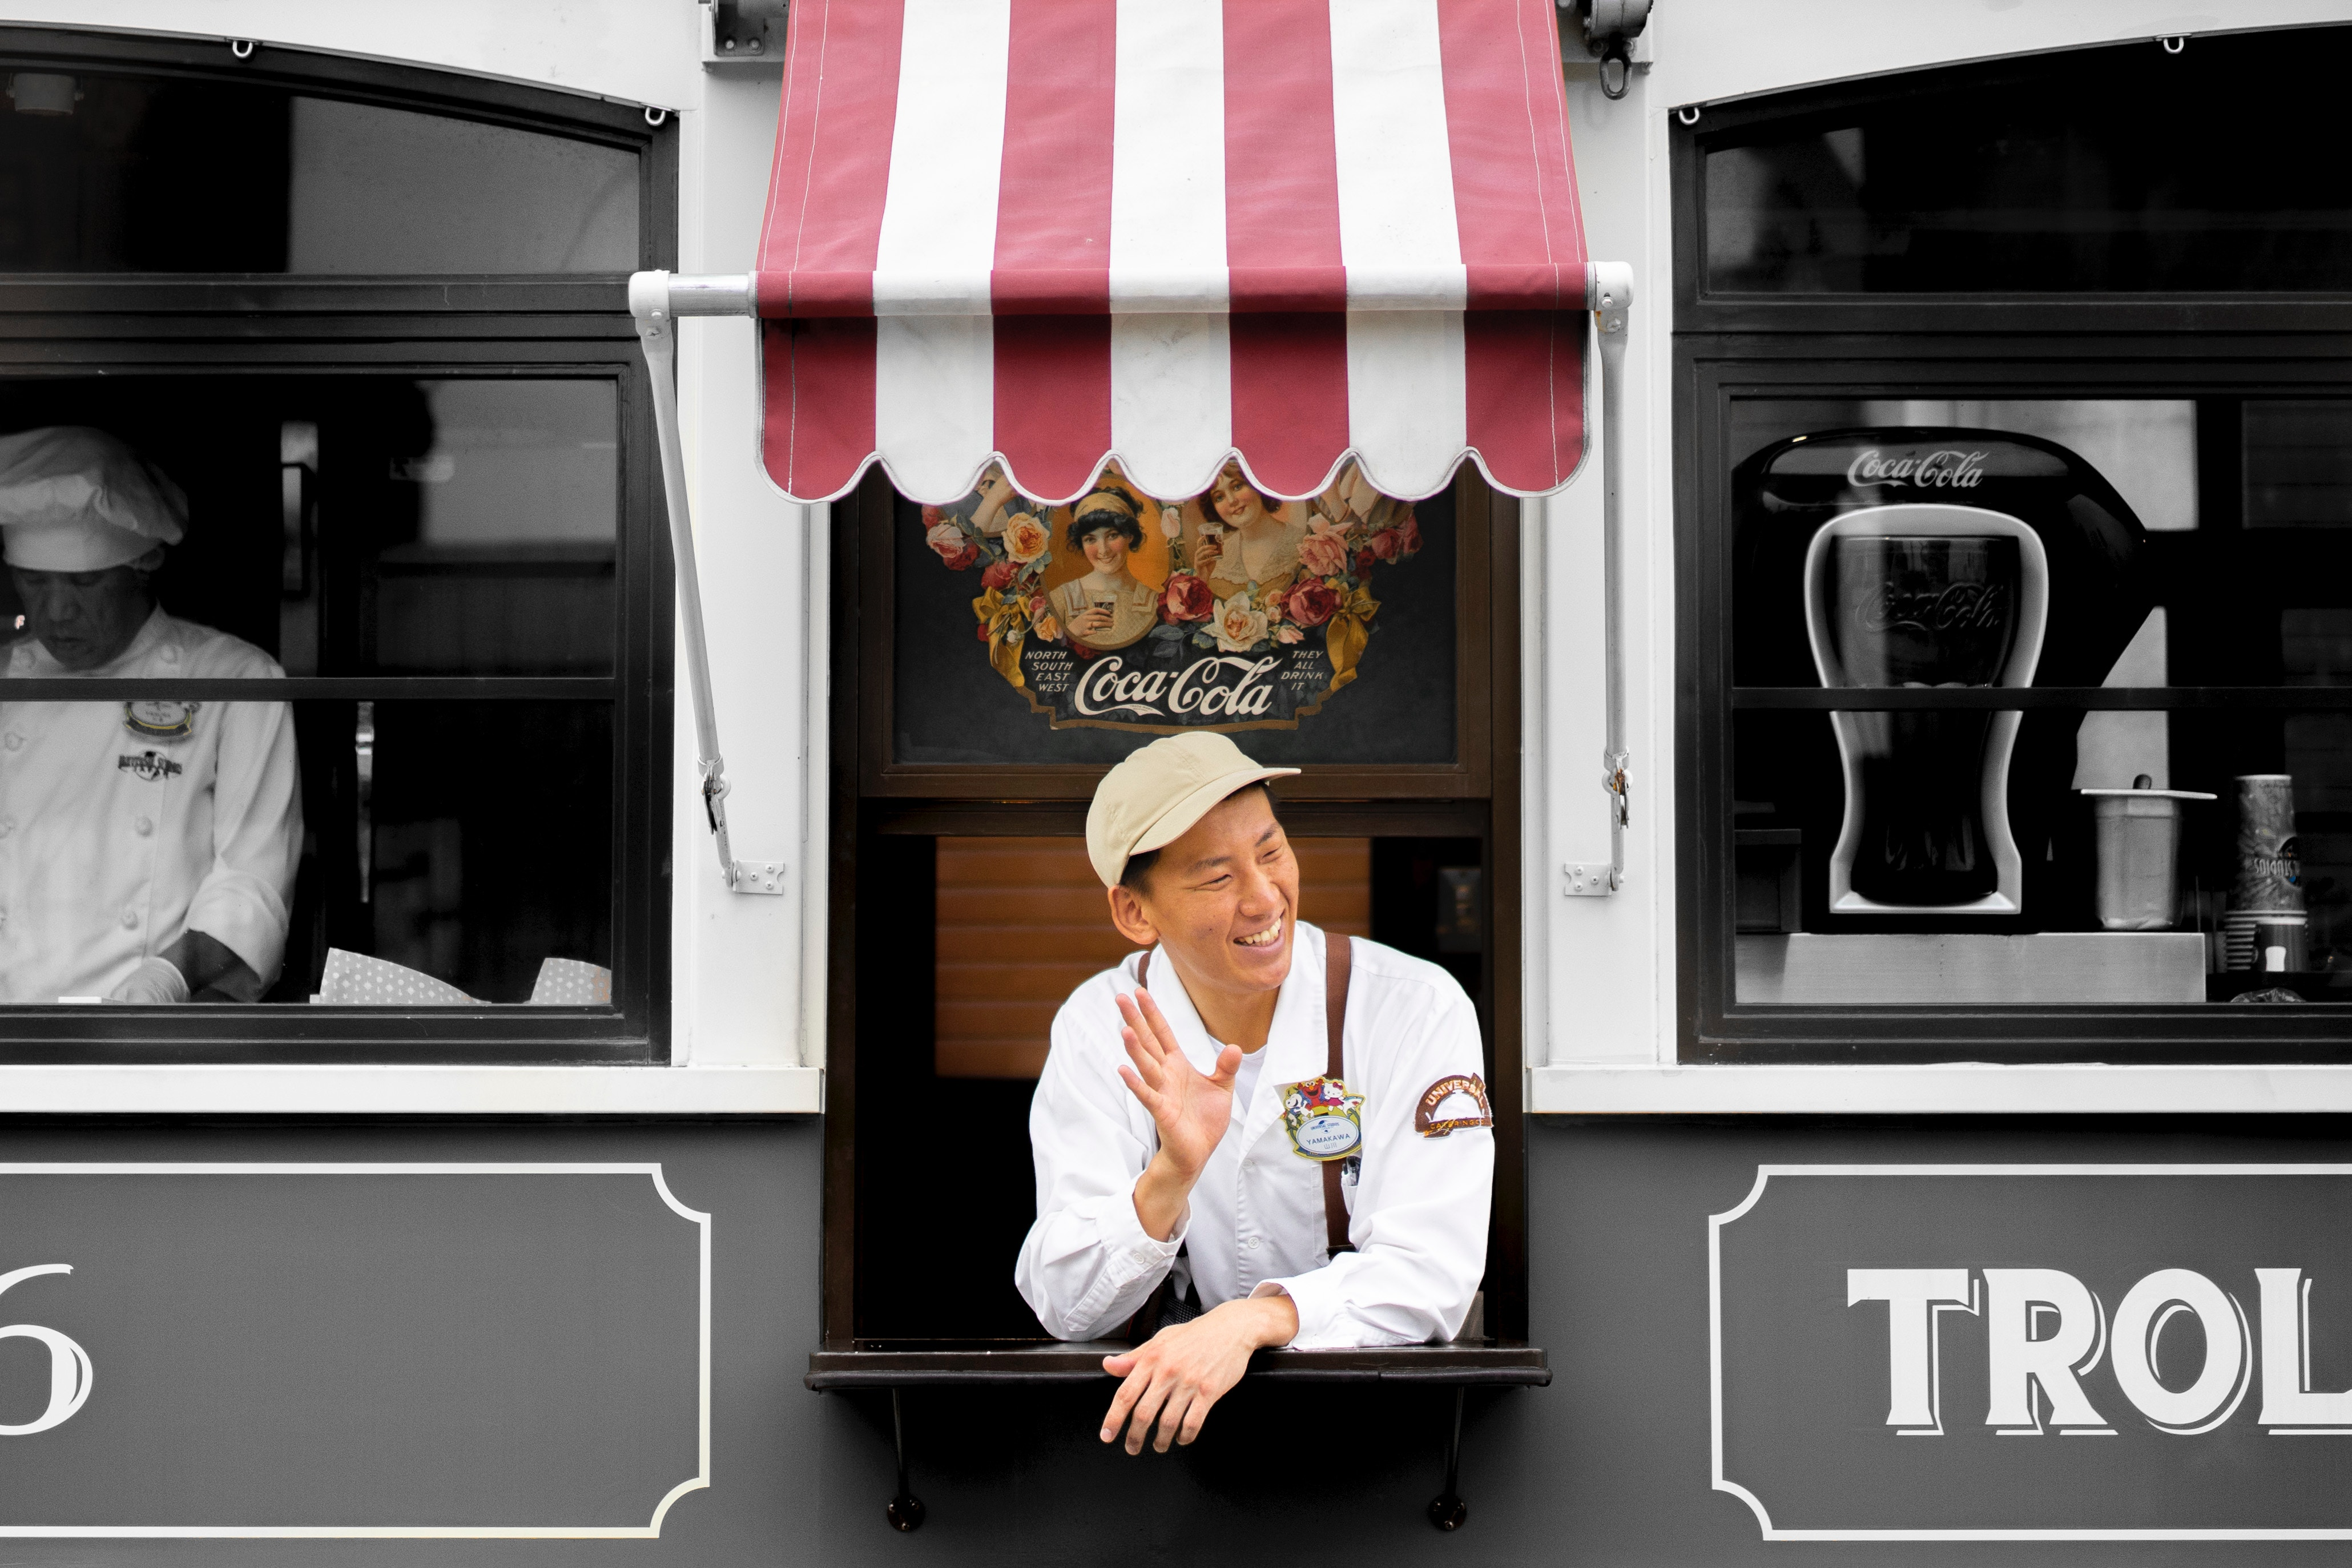 Customer satisfaction - delight customers- business success